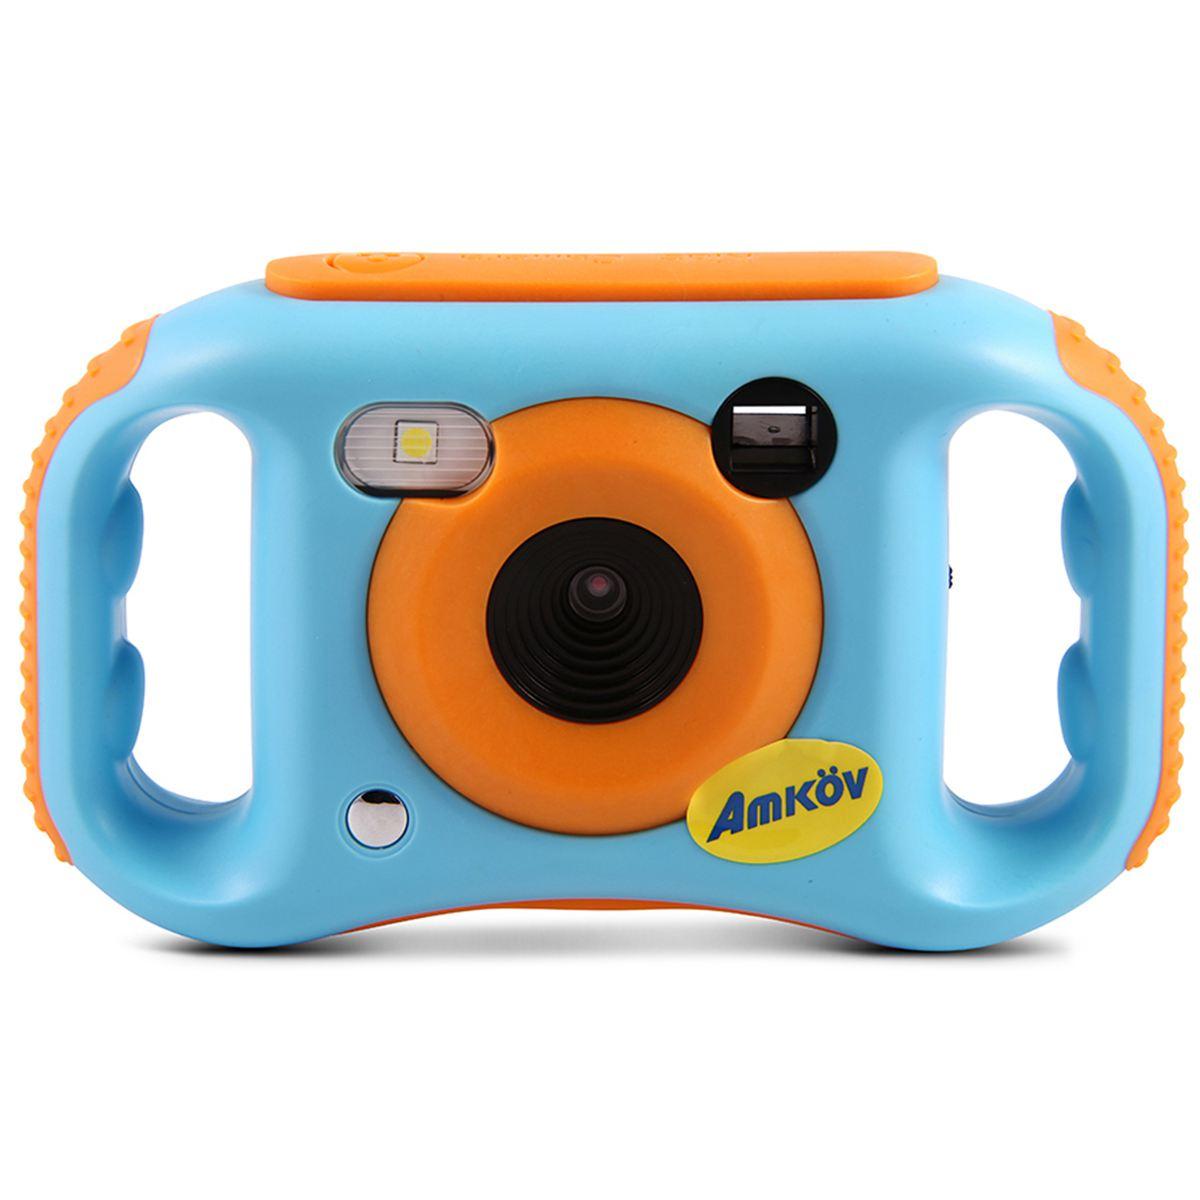 WOTT Amkov Kids Digital Video Camera WiFi Connection 5 Megapixels Gift For Children Boys Girls